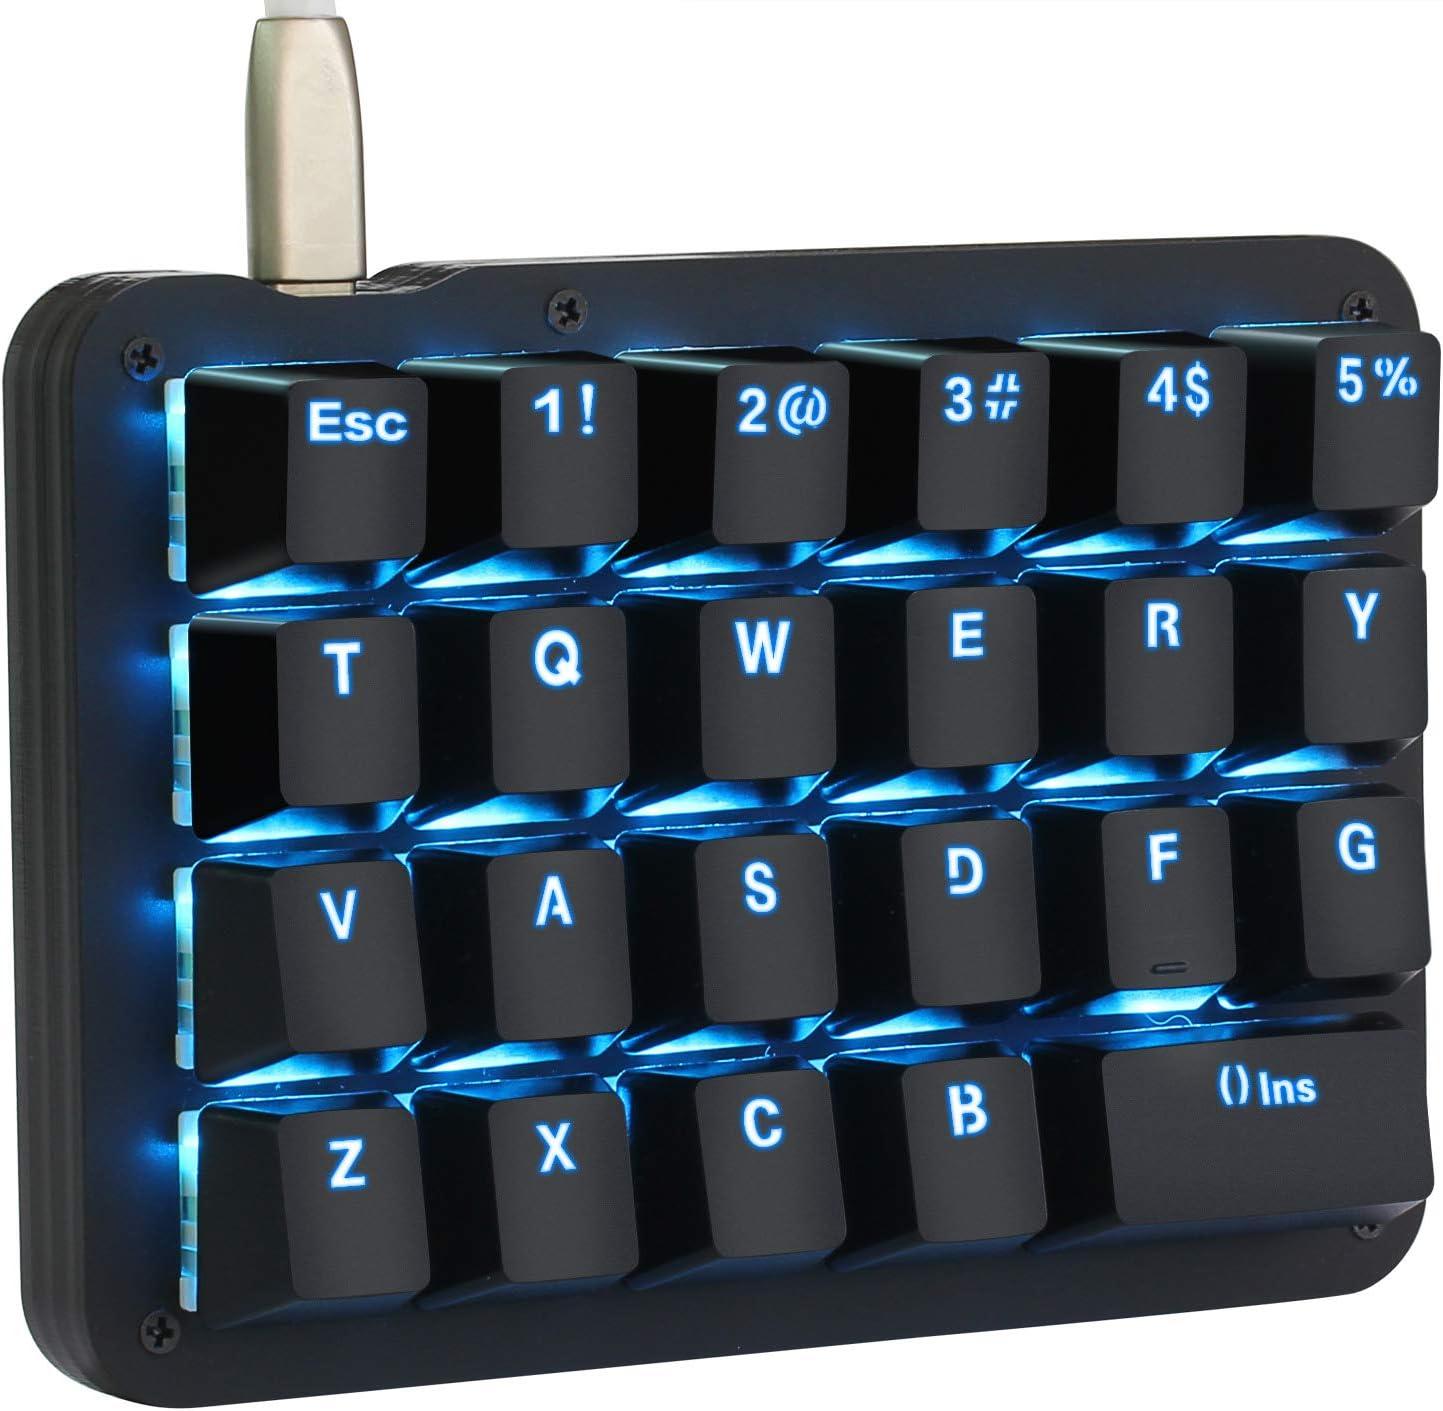 Koolertron One Handed Macro Mechanical Keyboard,Blue LED Backlit Portable Mini One-Handed Mechanical Gaming Keypad 23 Fully Programmable Keys (Blue Backlit/Blue switches)